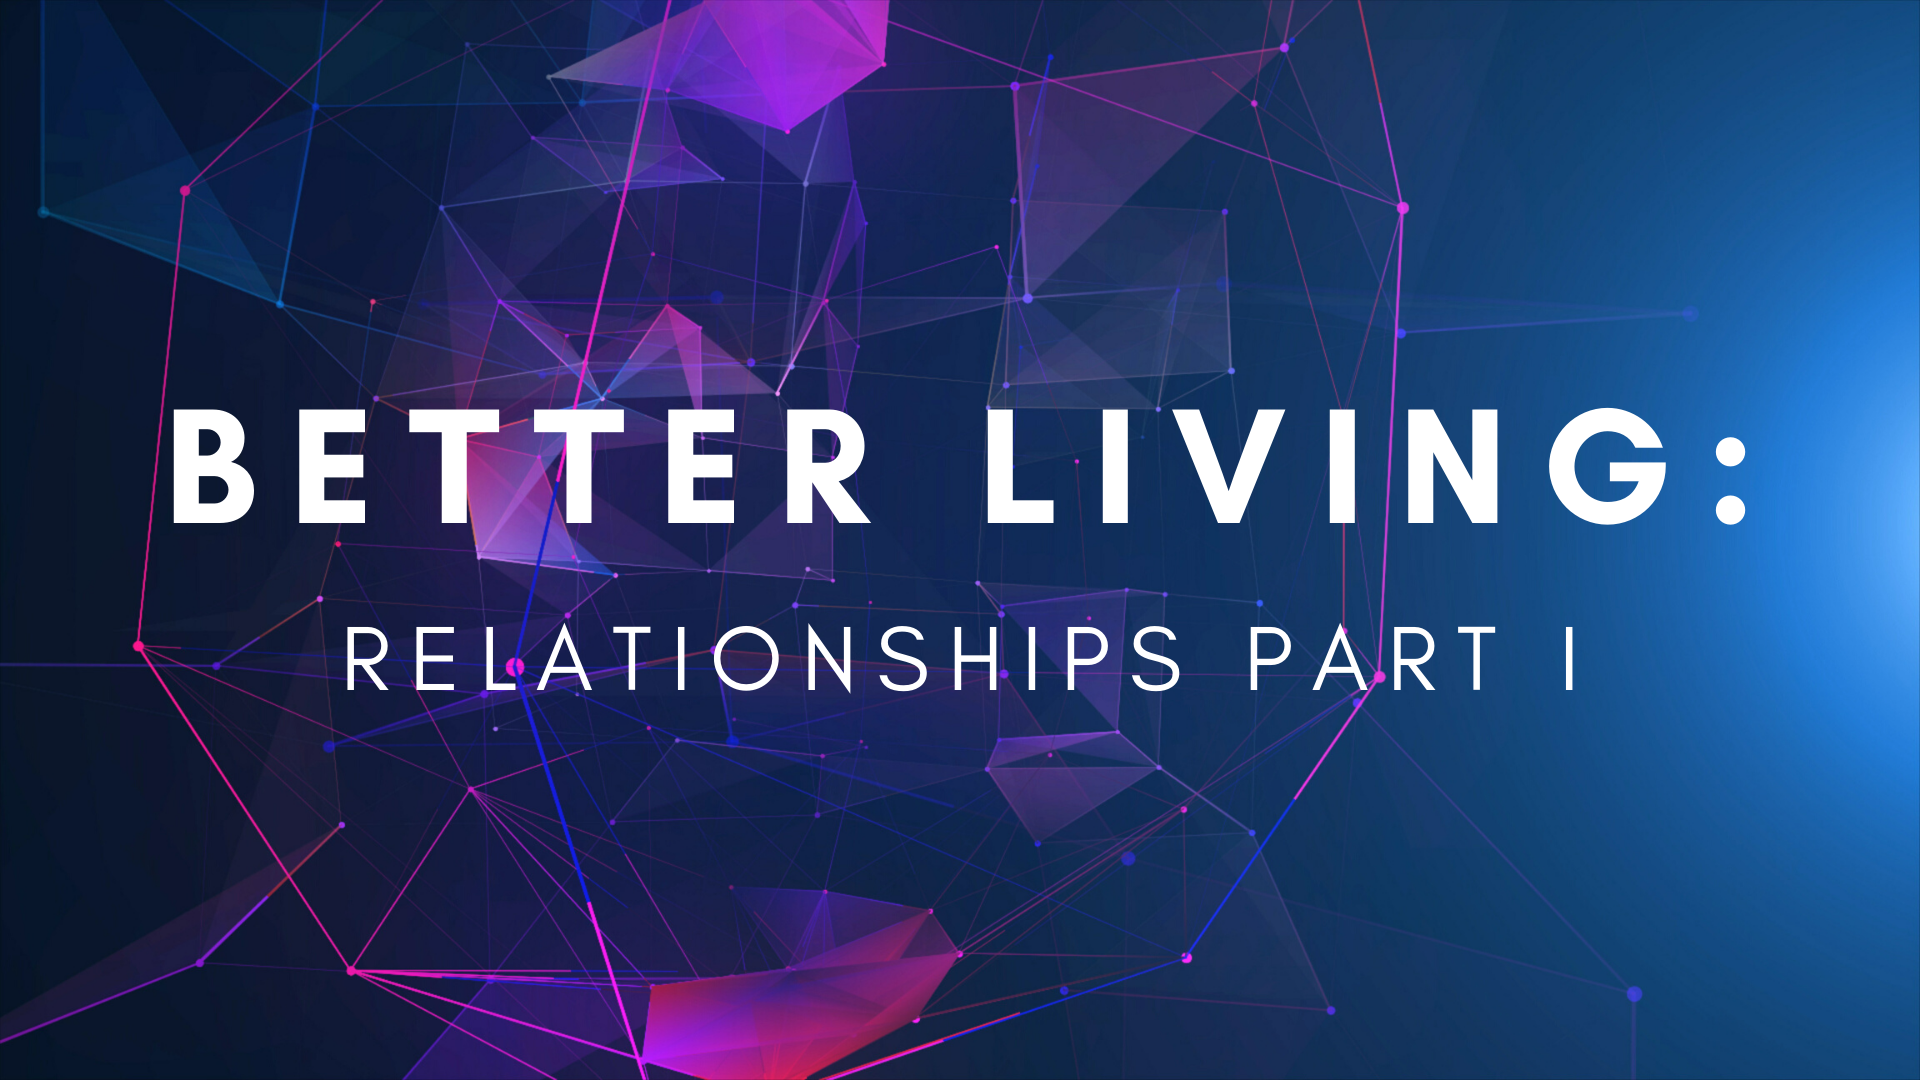 Better Living Part 1